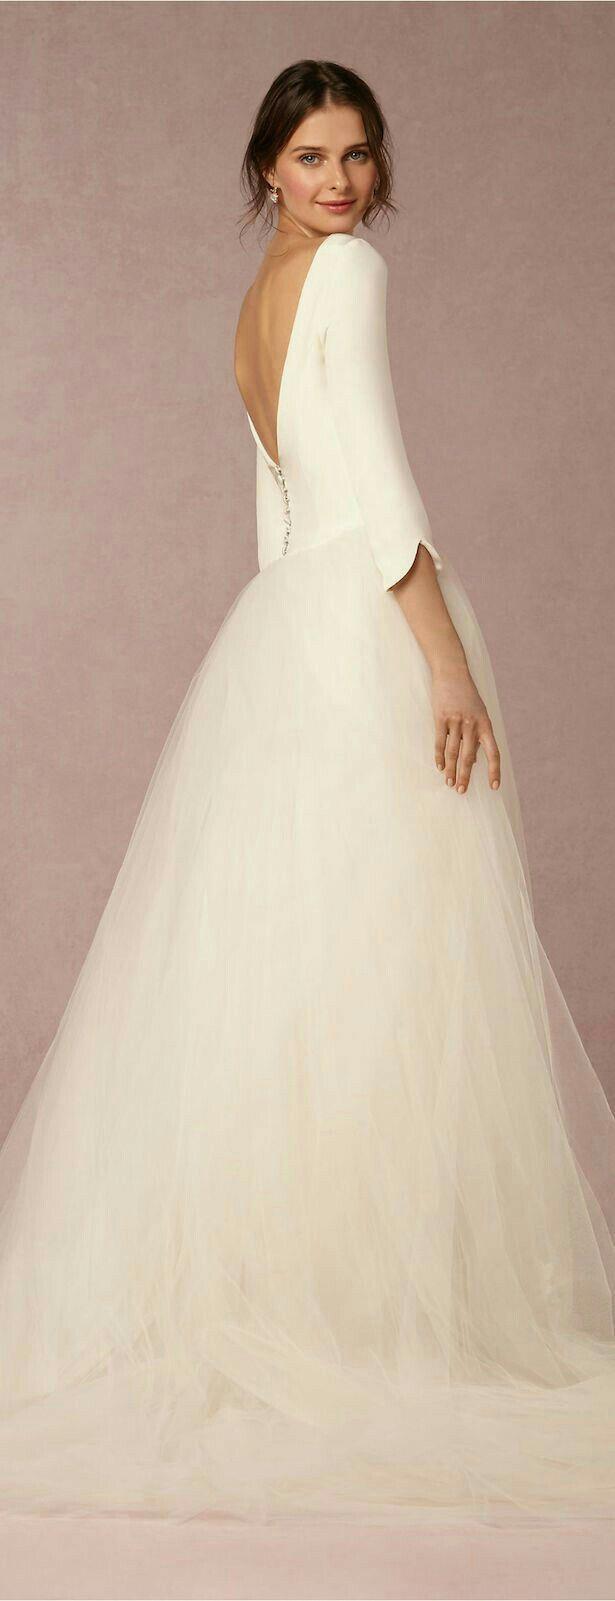 Ball gown wedding dresses unique wedding lande for Unique wedding dresses 2017